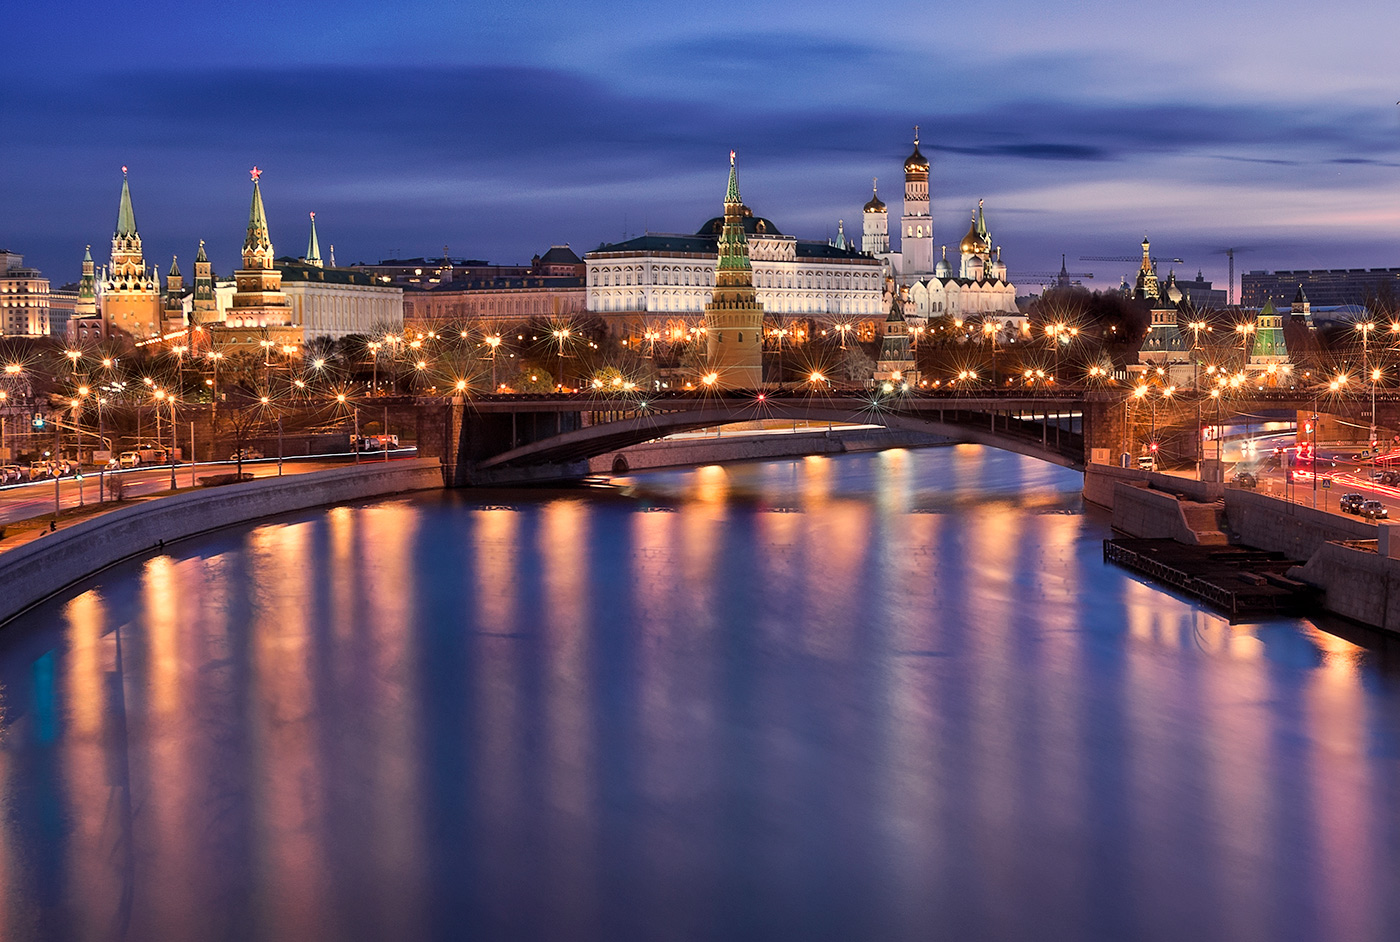 Вид на Кремль, Москва